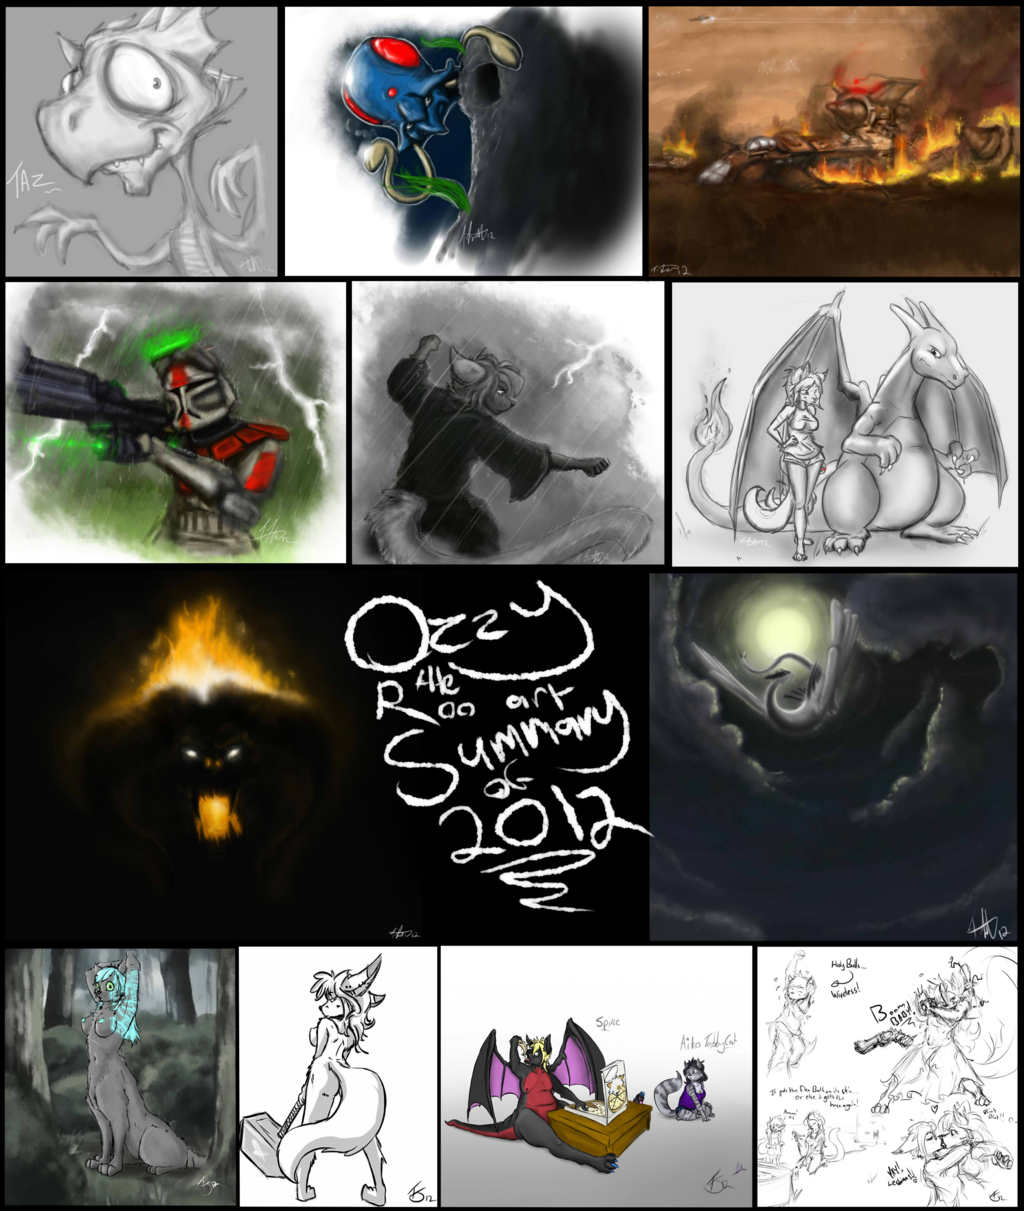 Art summary 2012 - Ozzy the Roo